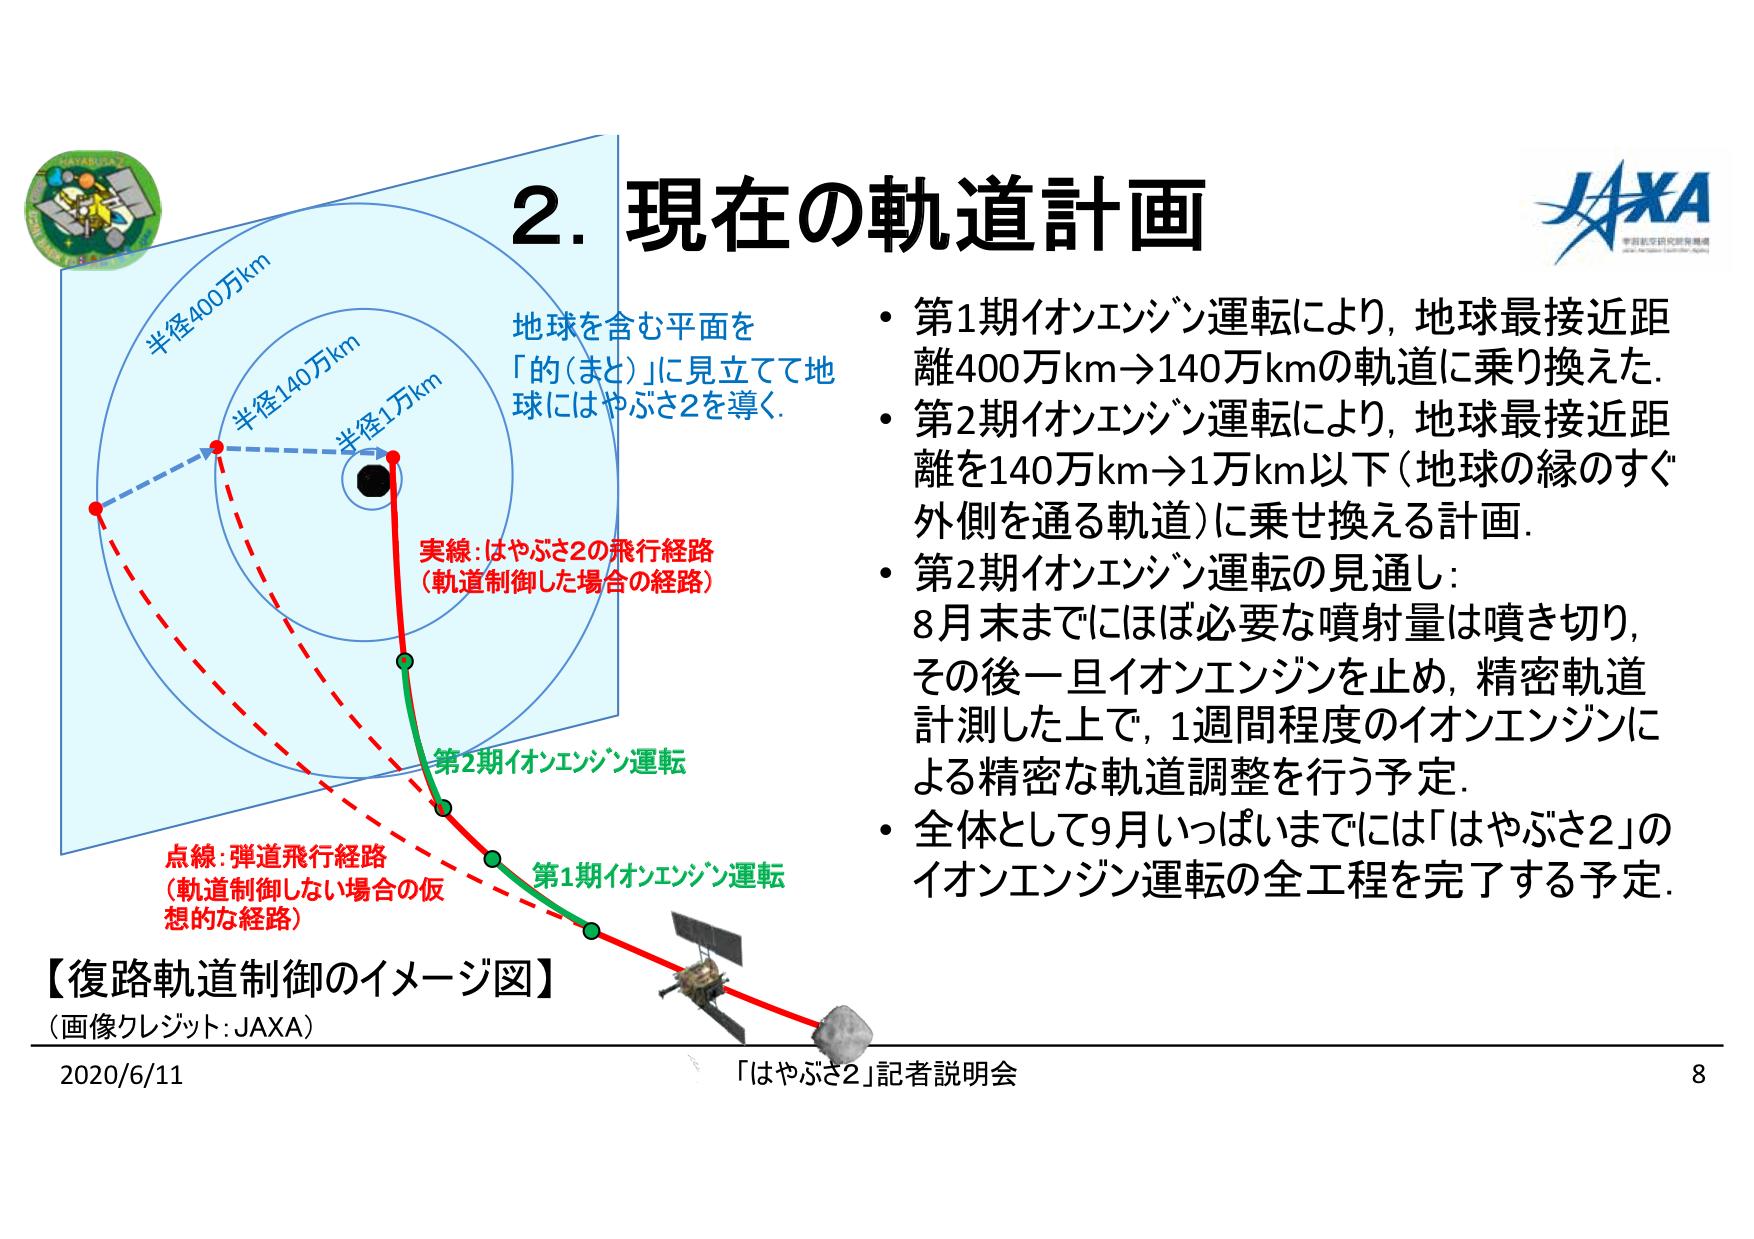 f:id:Imamura:20200611094525p:plain